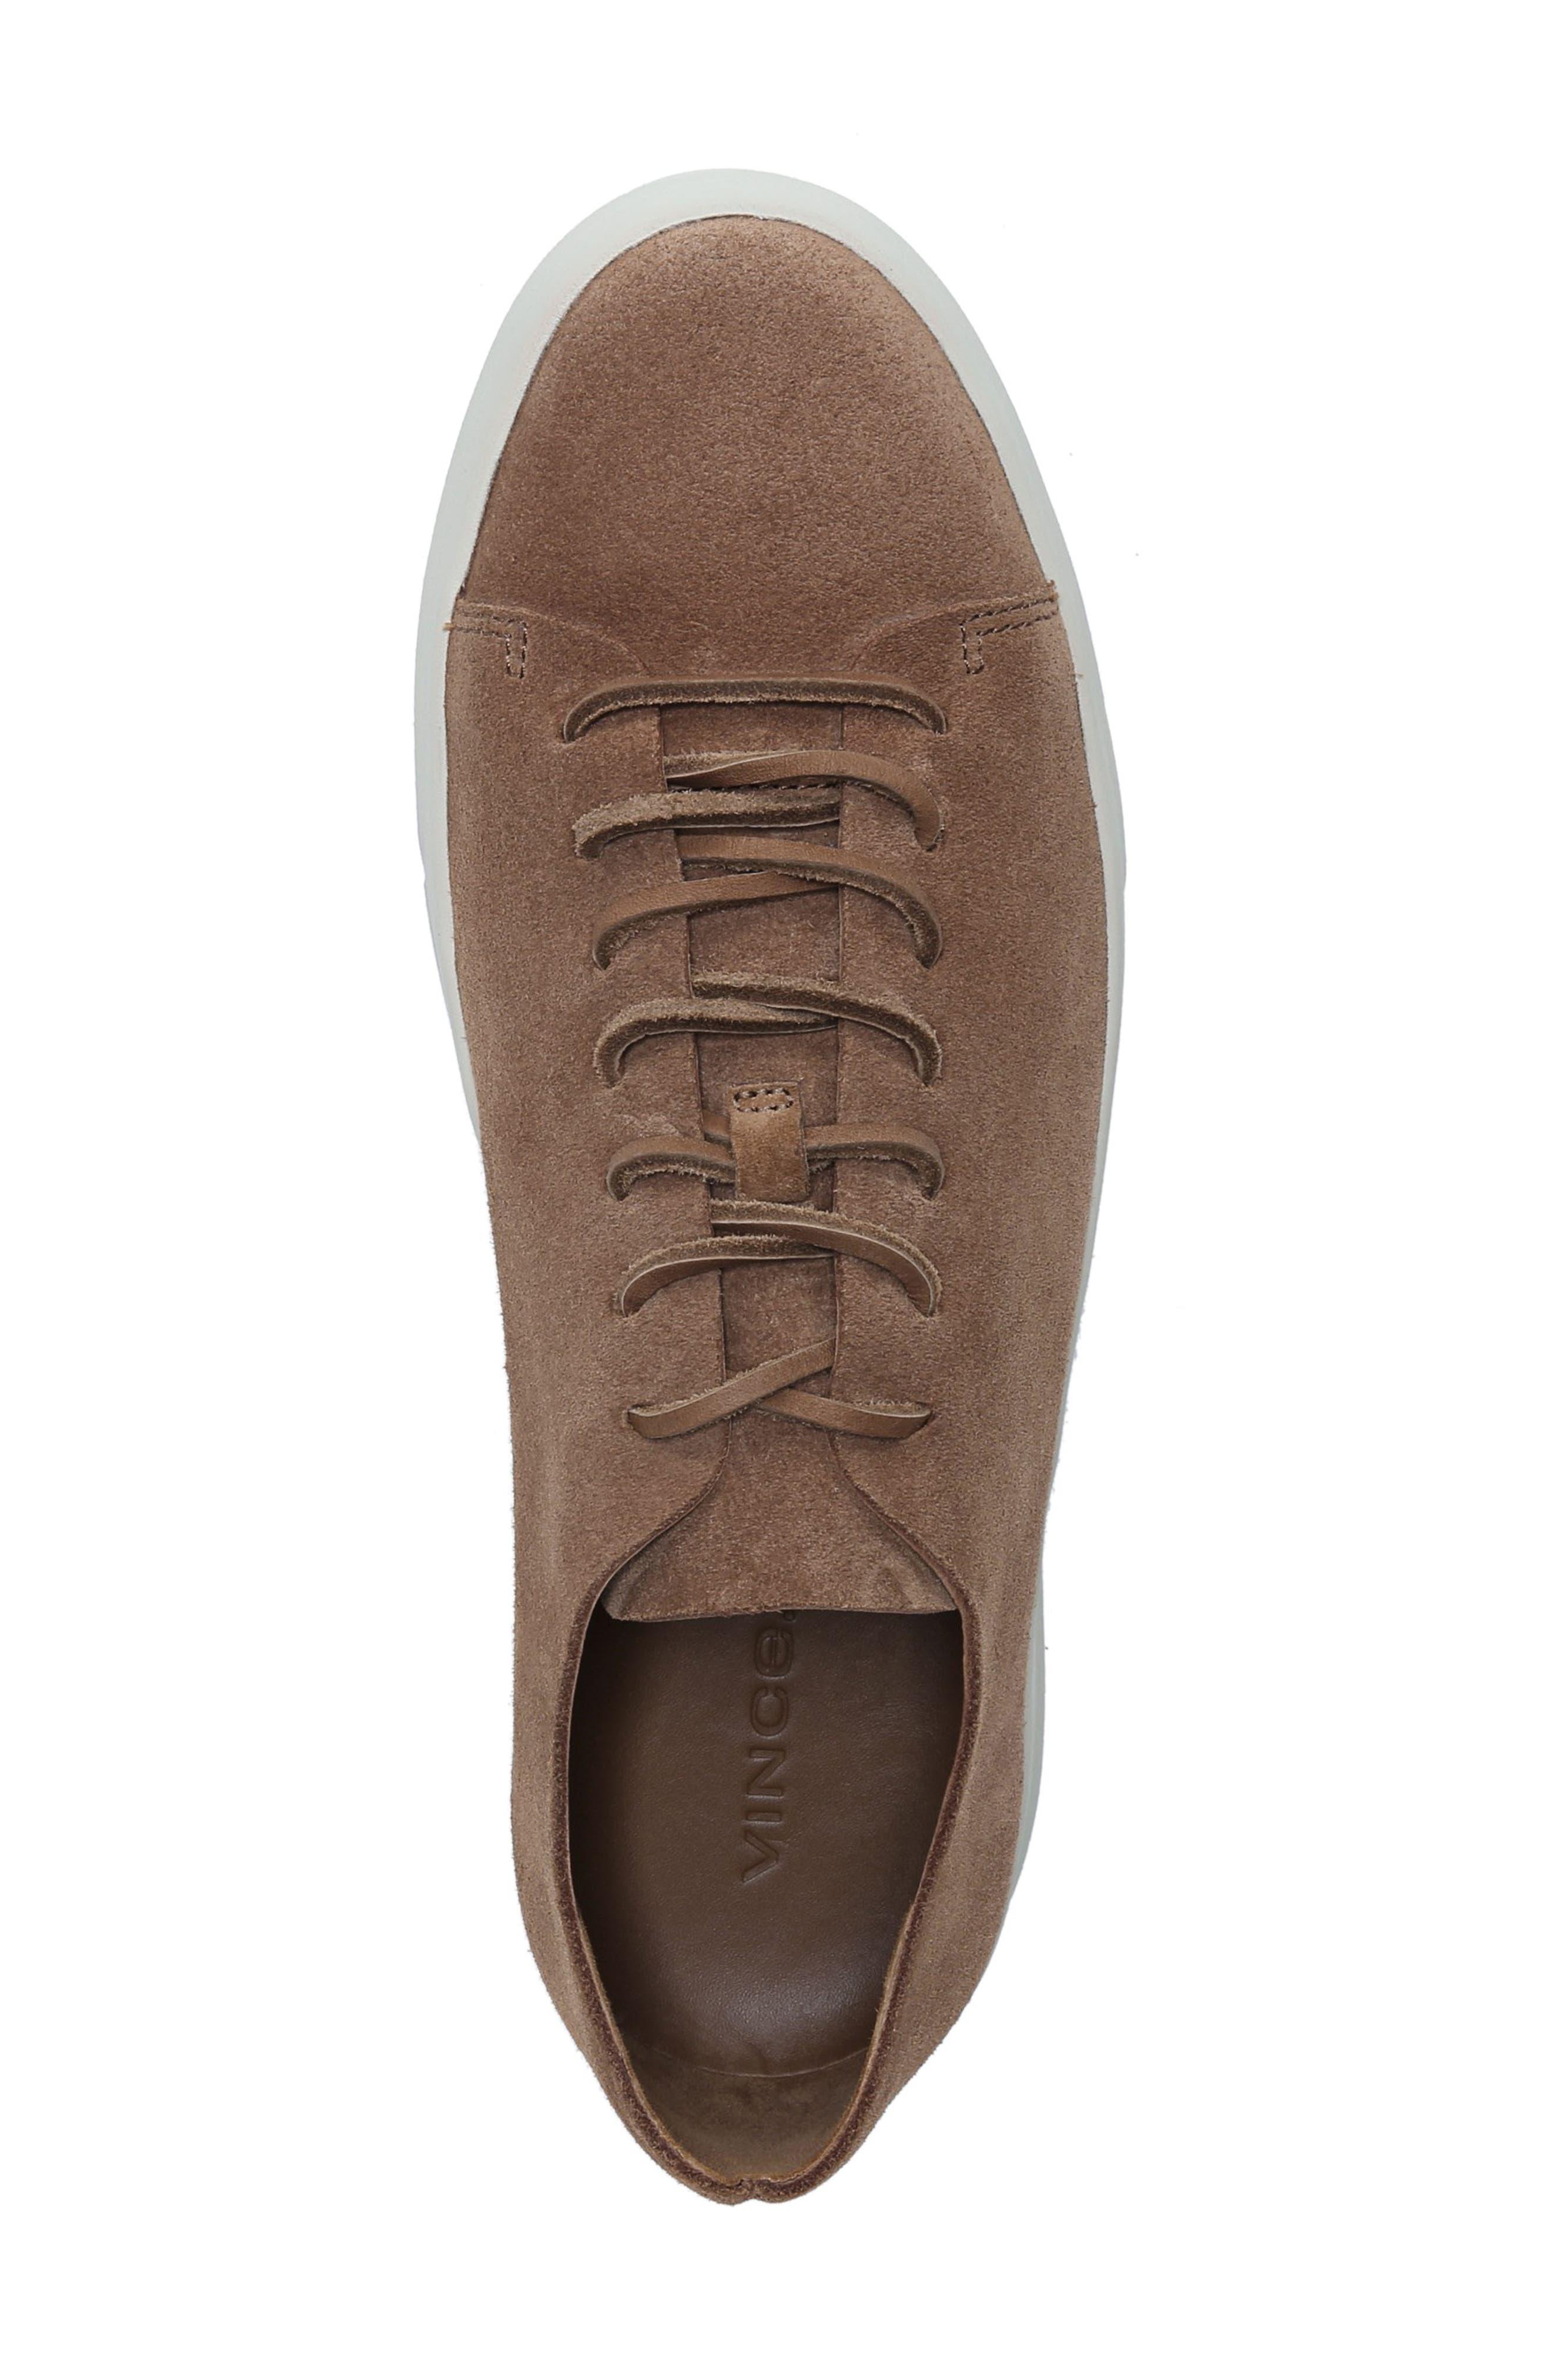 Copeland Sneaker,                             Alternate thumbnail 4, color,                             CEDAR